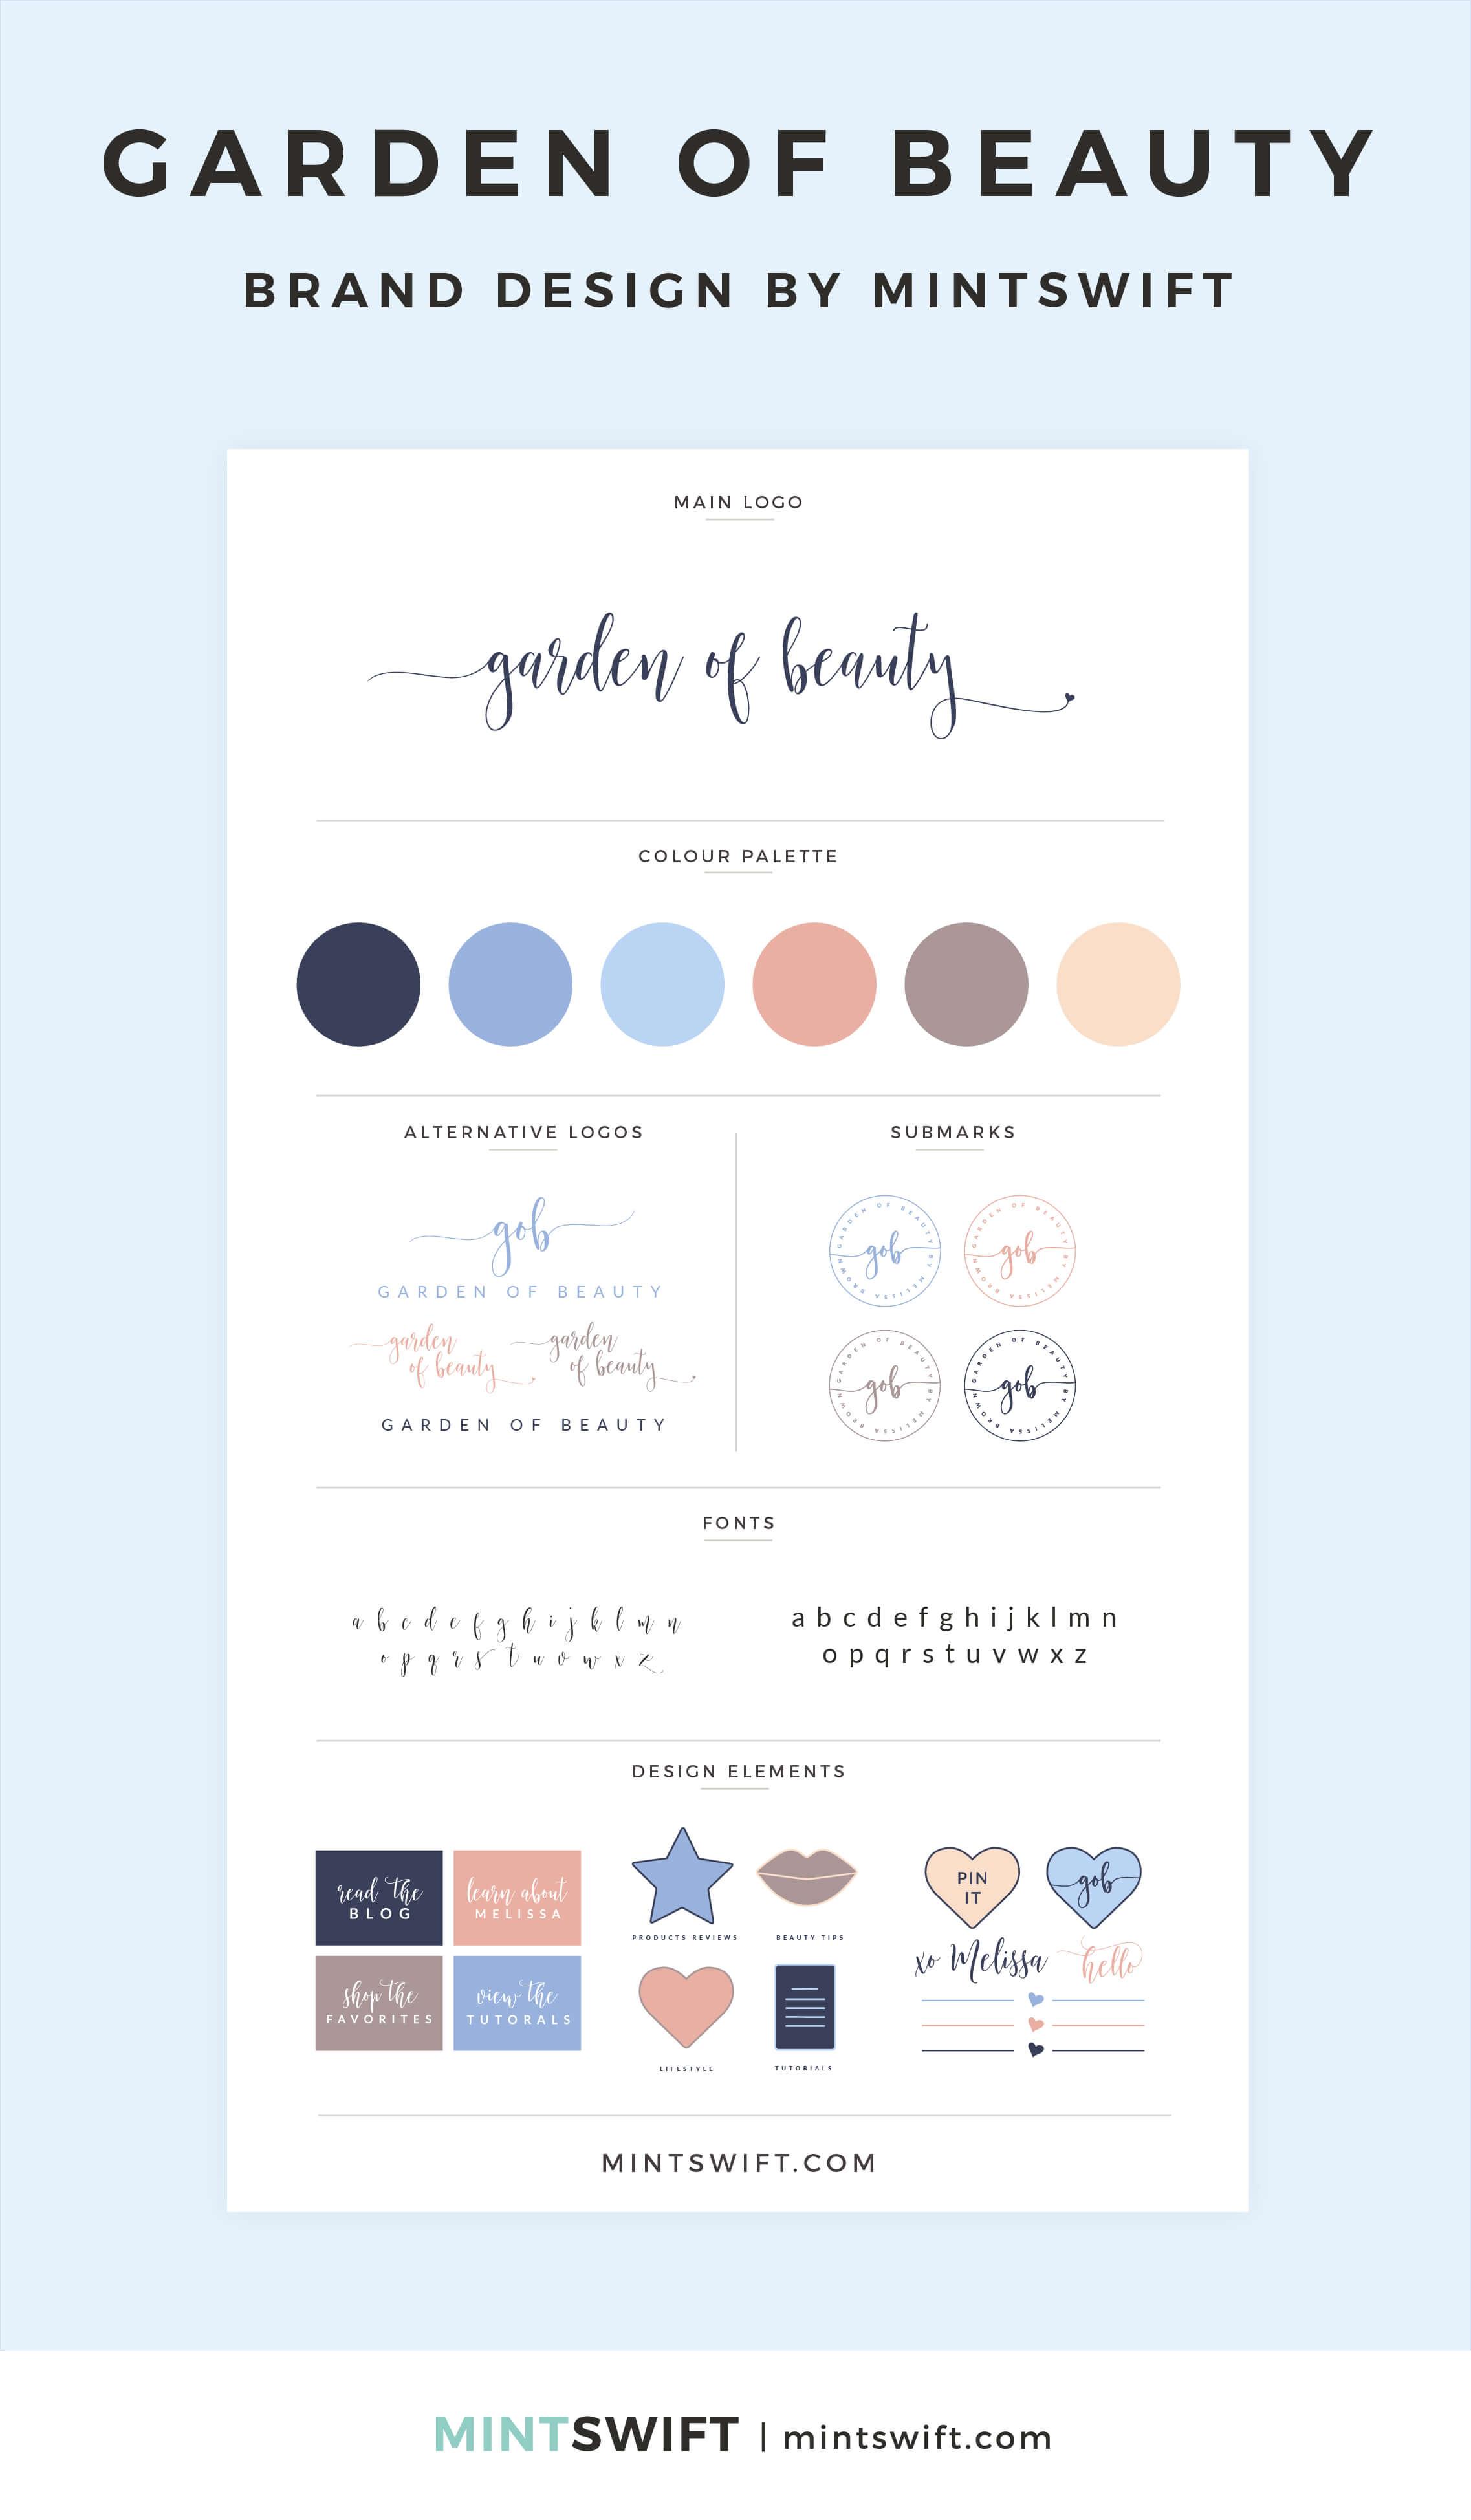 Garden of Beauty - Brand Design - MintSwift - Adrianna Leszczynska